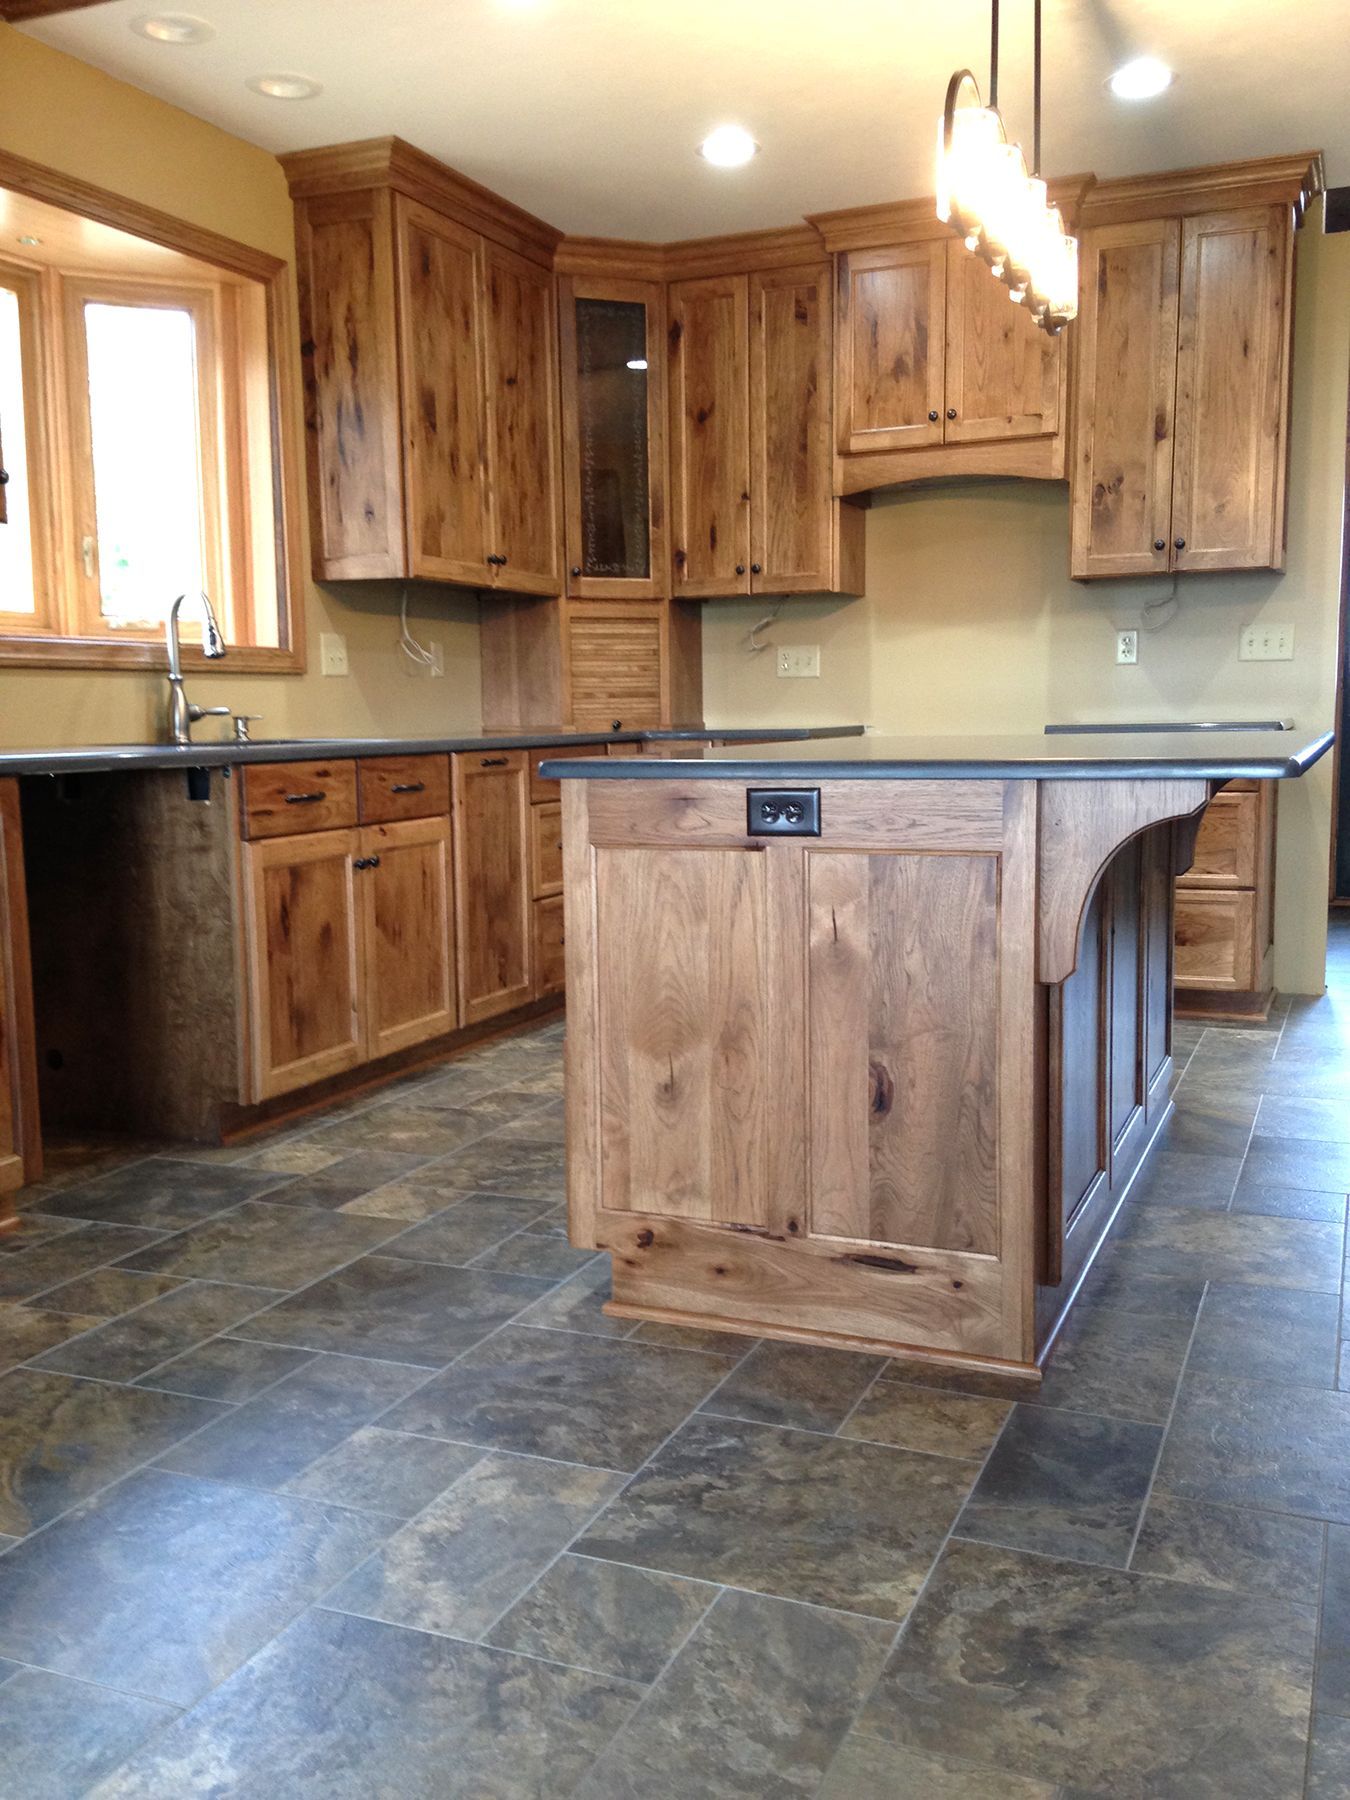 hickory kitchen cabinets hickory kitchen cabinets hickory kitchen rustic kitchen design on farmhouse kitchen hickory cabinets id=30271